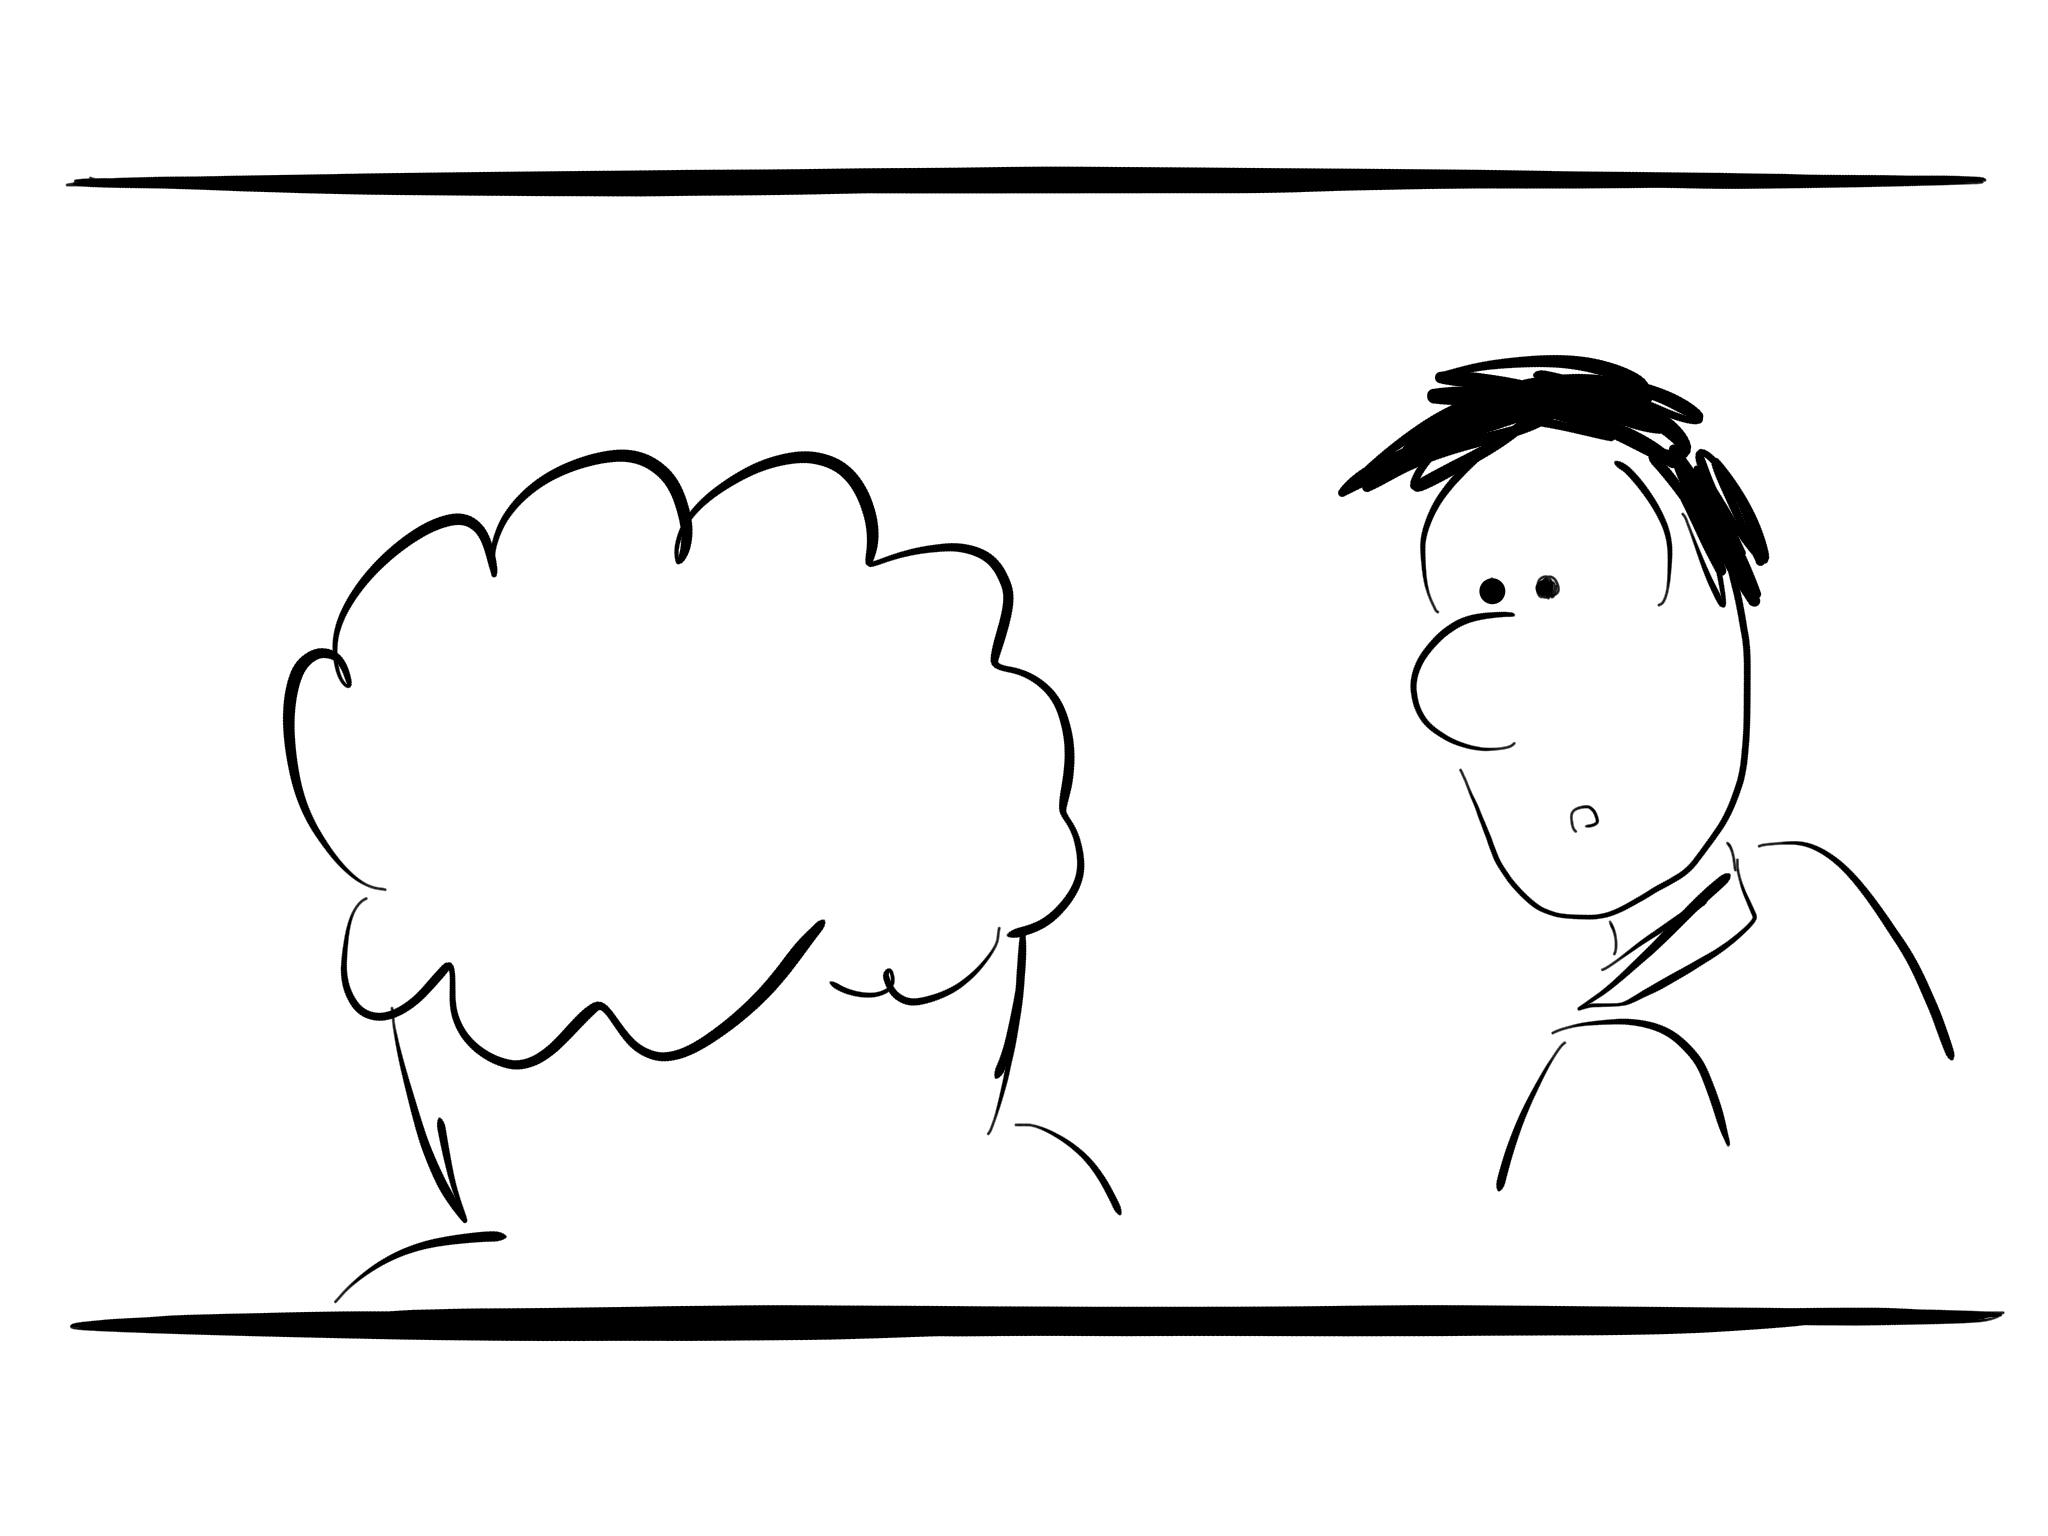 BDF_Storyboards_73.jpg